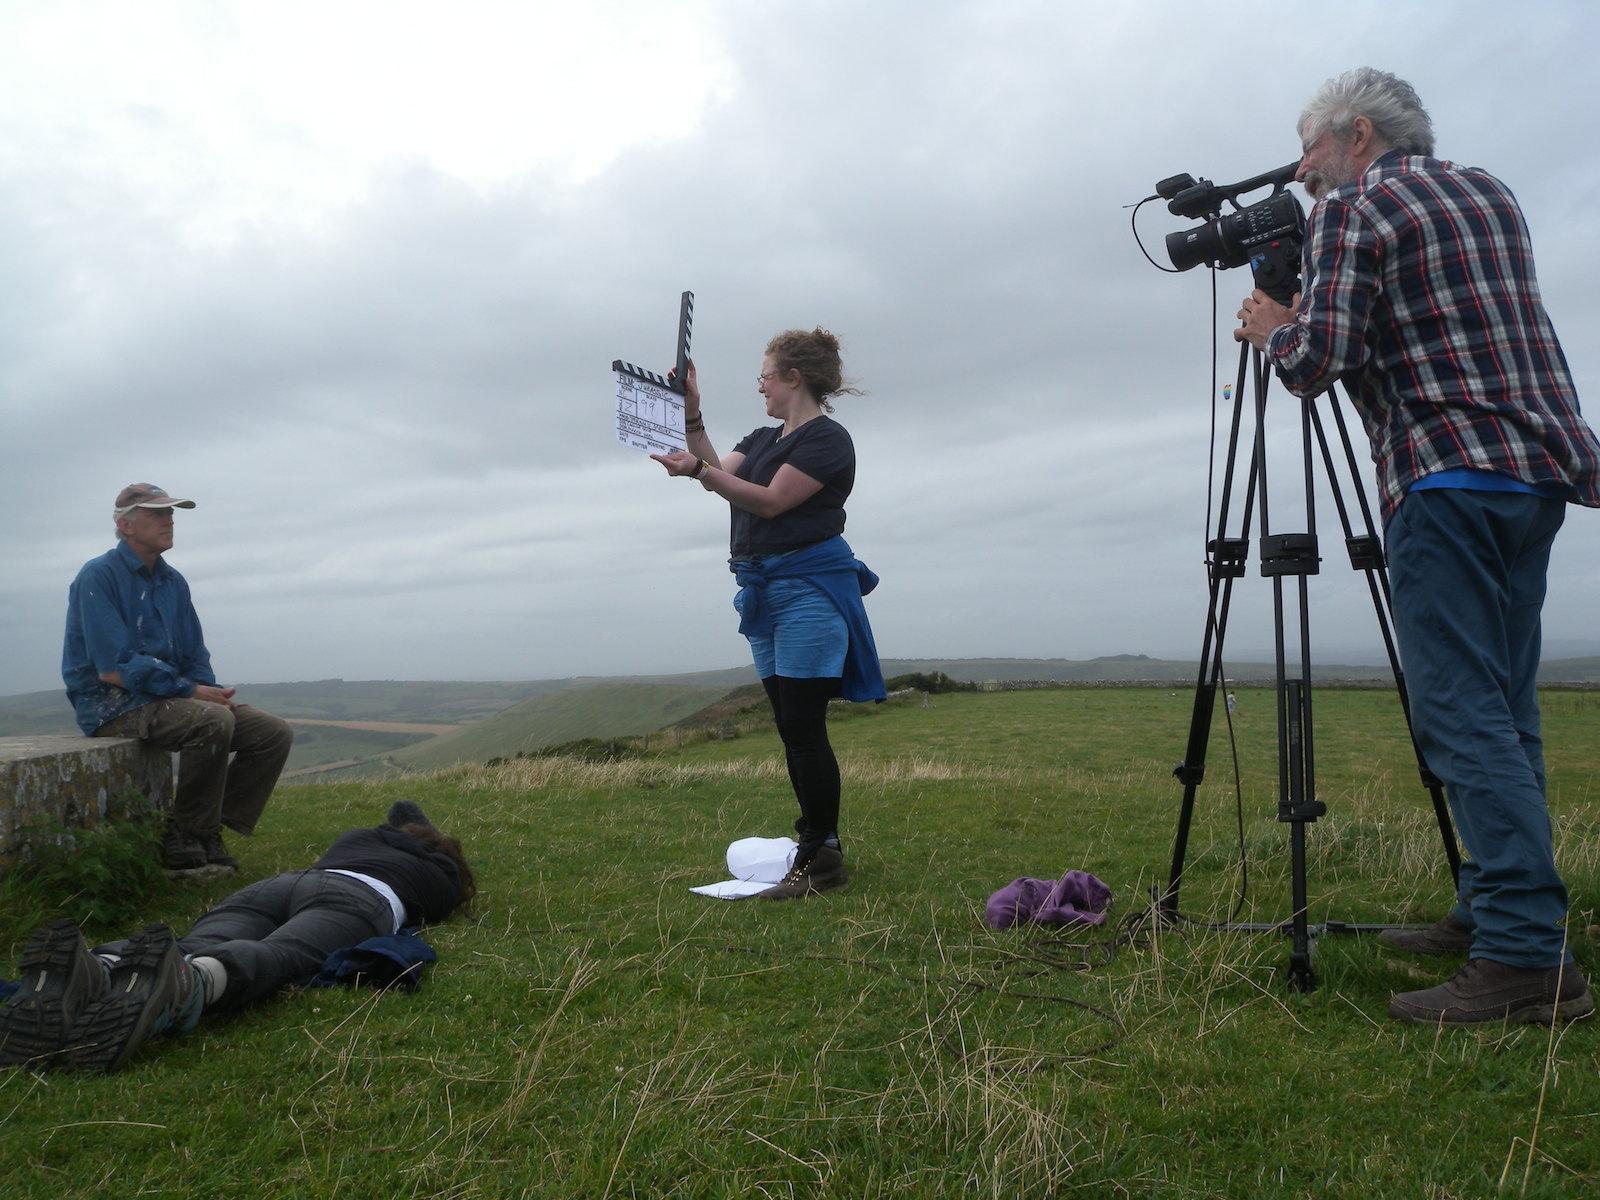 August 2012 - 3D Film shoot, Swyre Head, Dorset